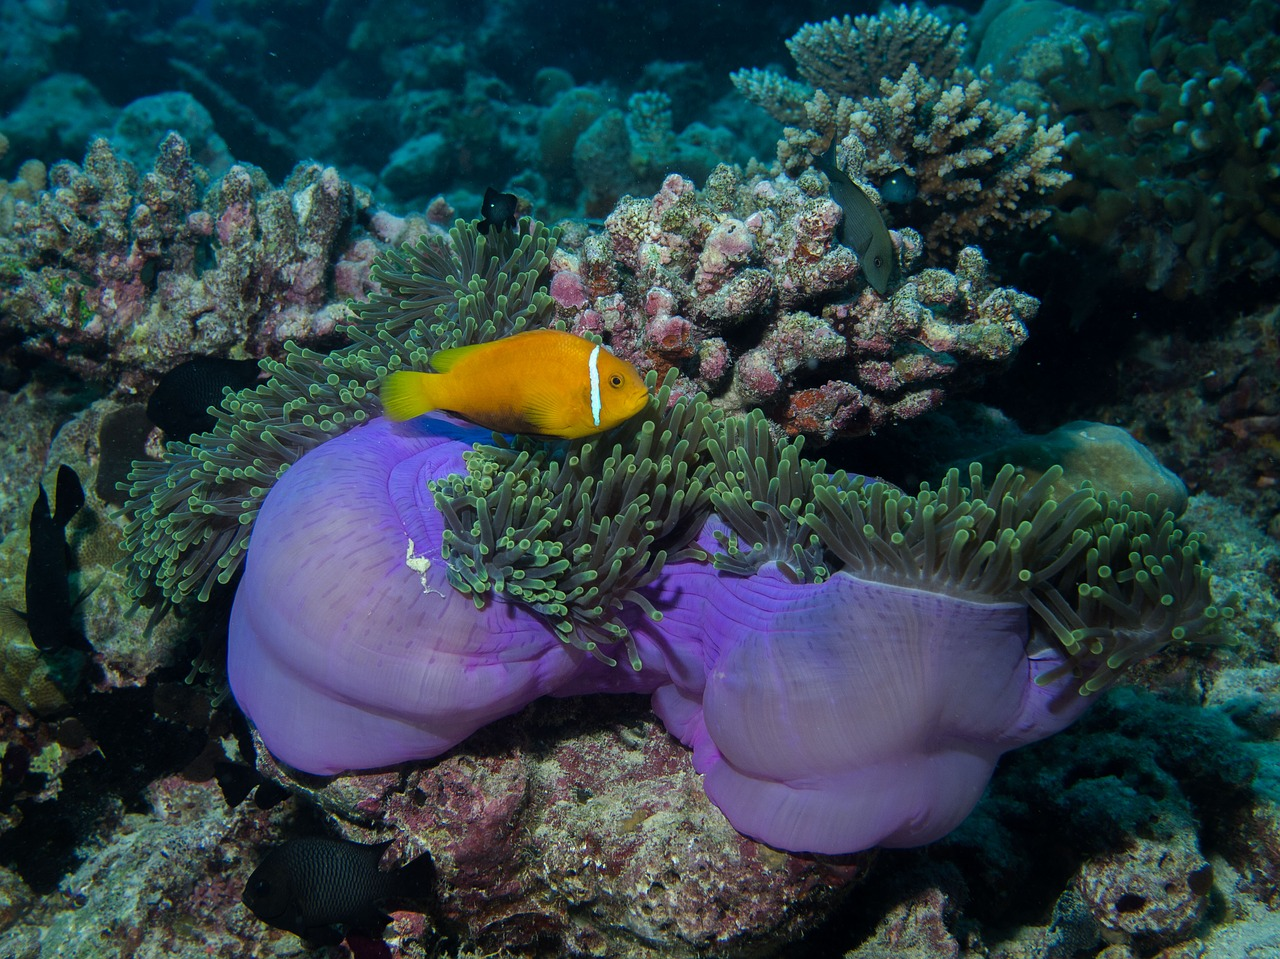 A little orange fish with a bright white stripe down its neck cruising over iridescent purple soft corals